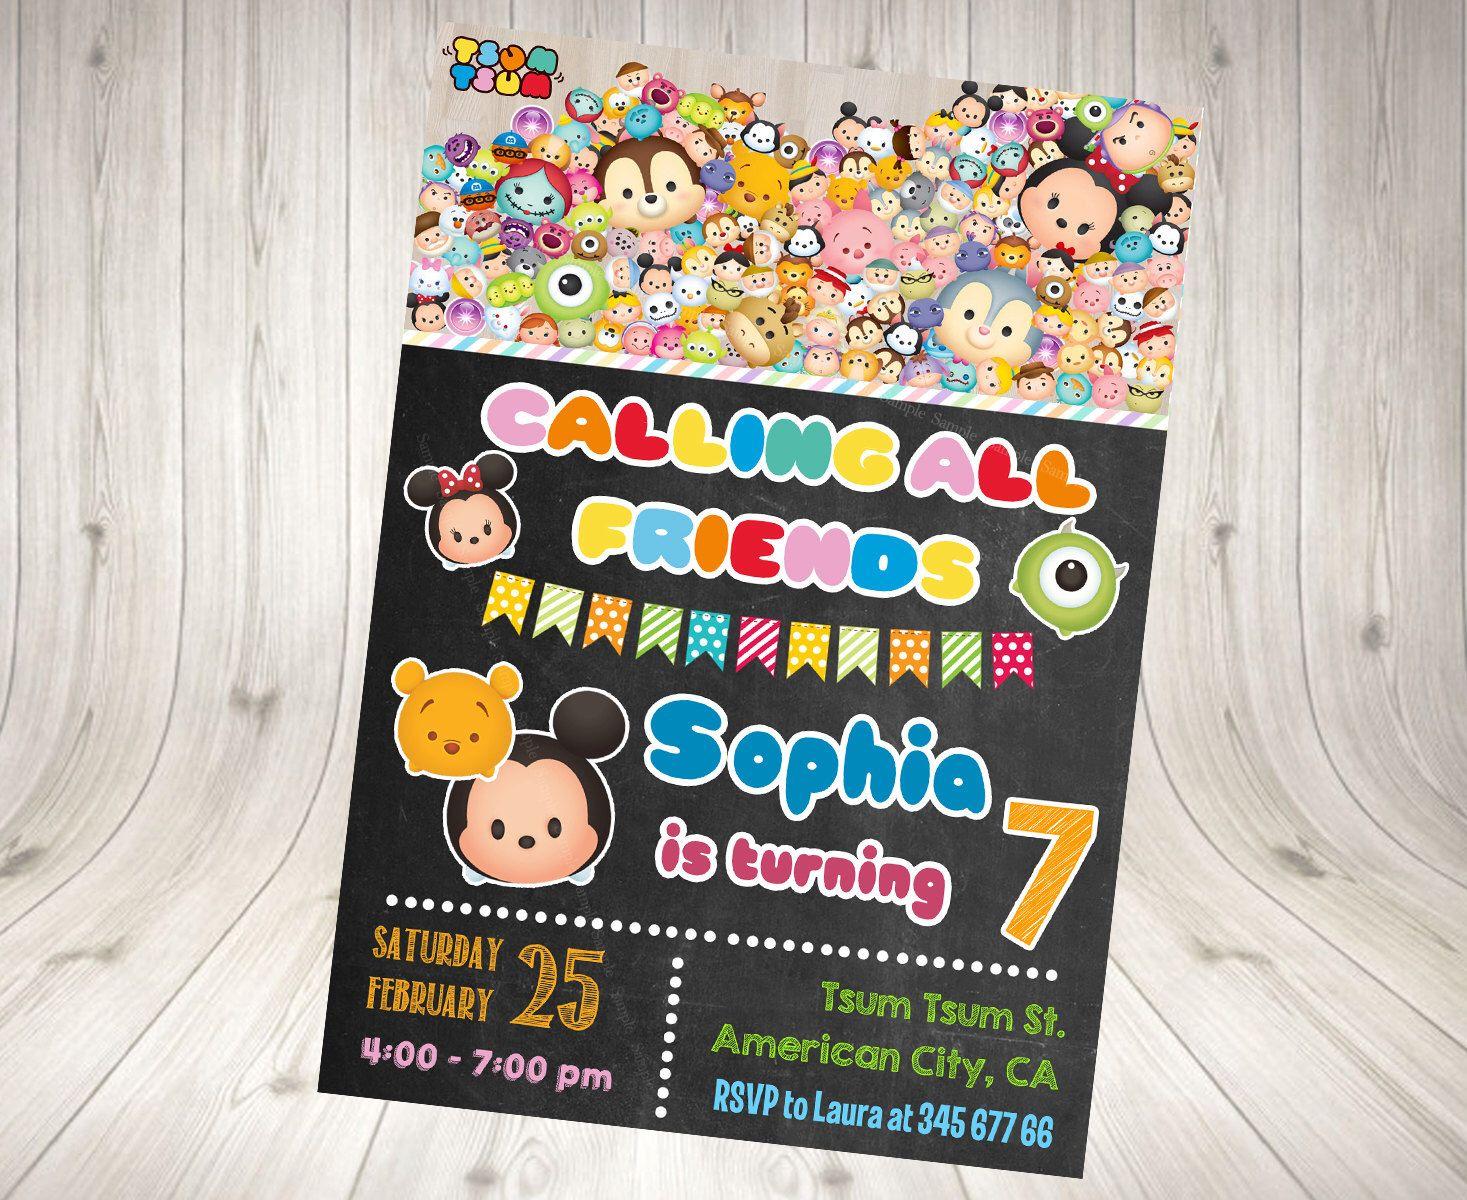 Tsum Tsum Invitation, Tsum Tsum Birthday Invitation, Tsum Tsum Party Printables.Tsum Tsum blackboard invitation. Tsum Tsum chalkboard by DecorationsLeon on Etsy https://www.etsy.com/listing/265474776/tsum-tsum-invitation-tsum-tsum-birthday